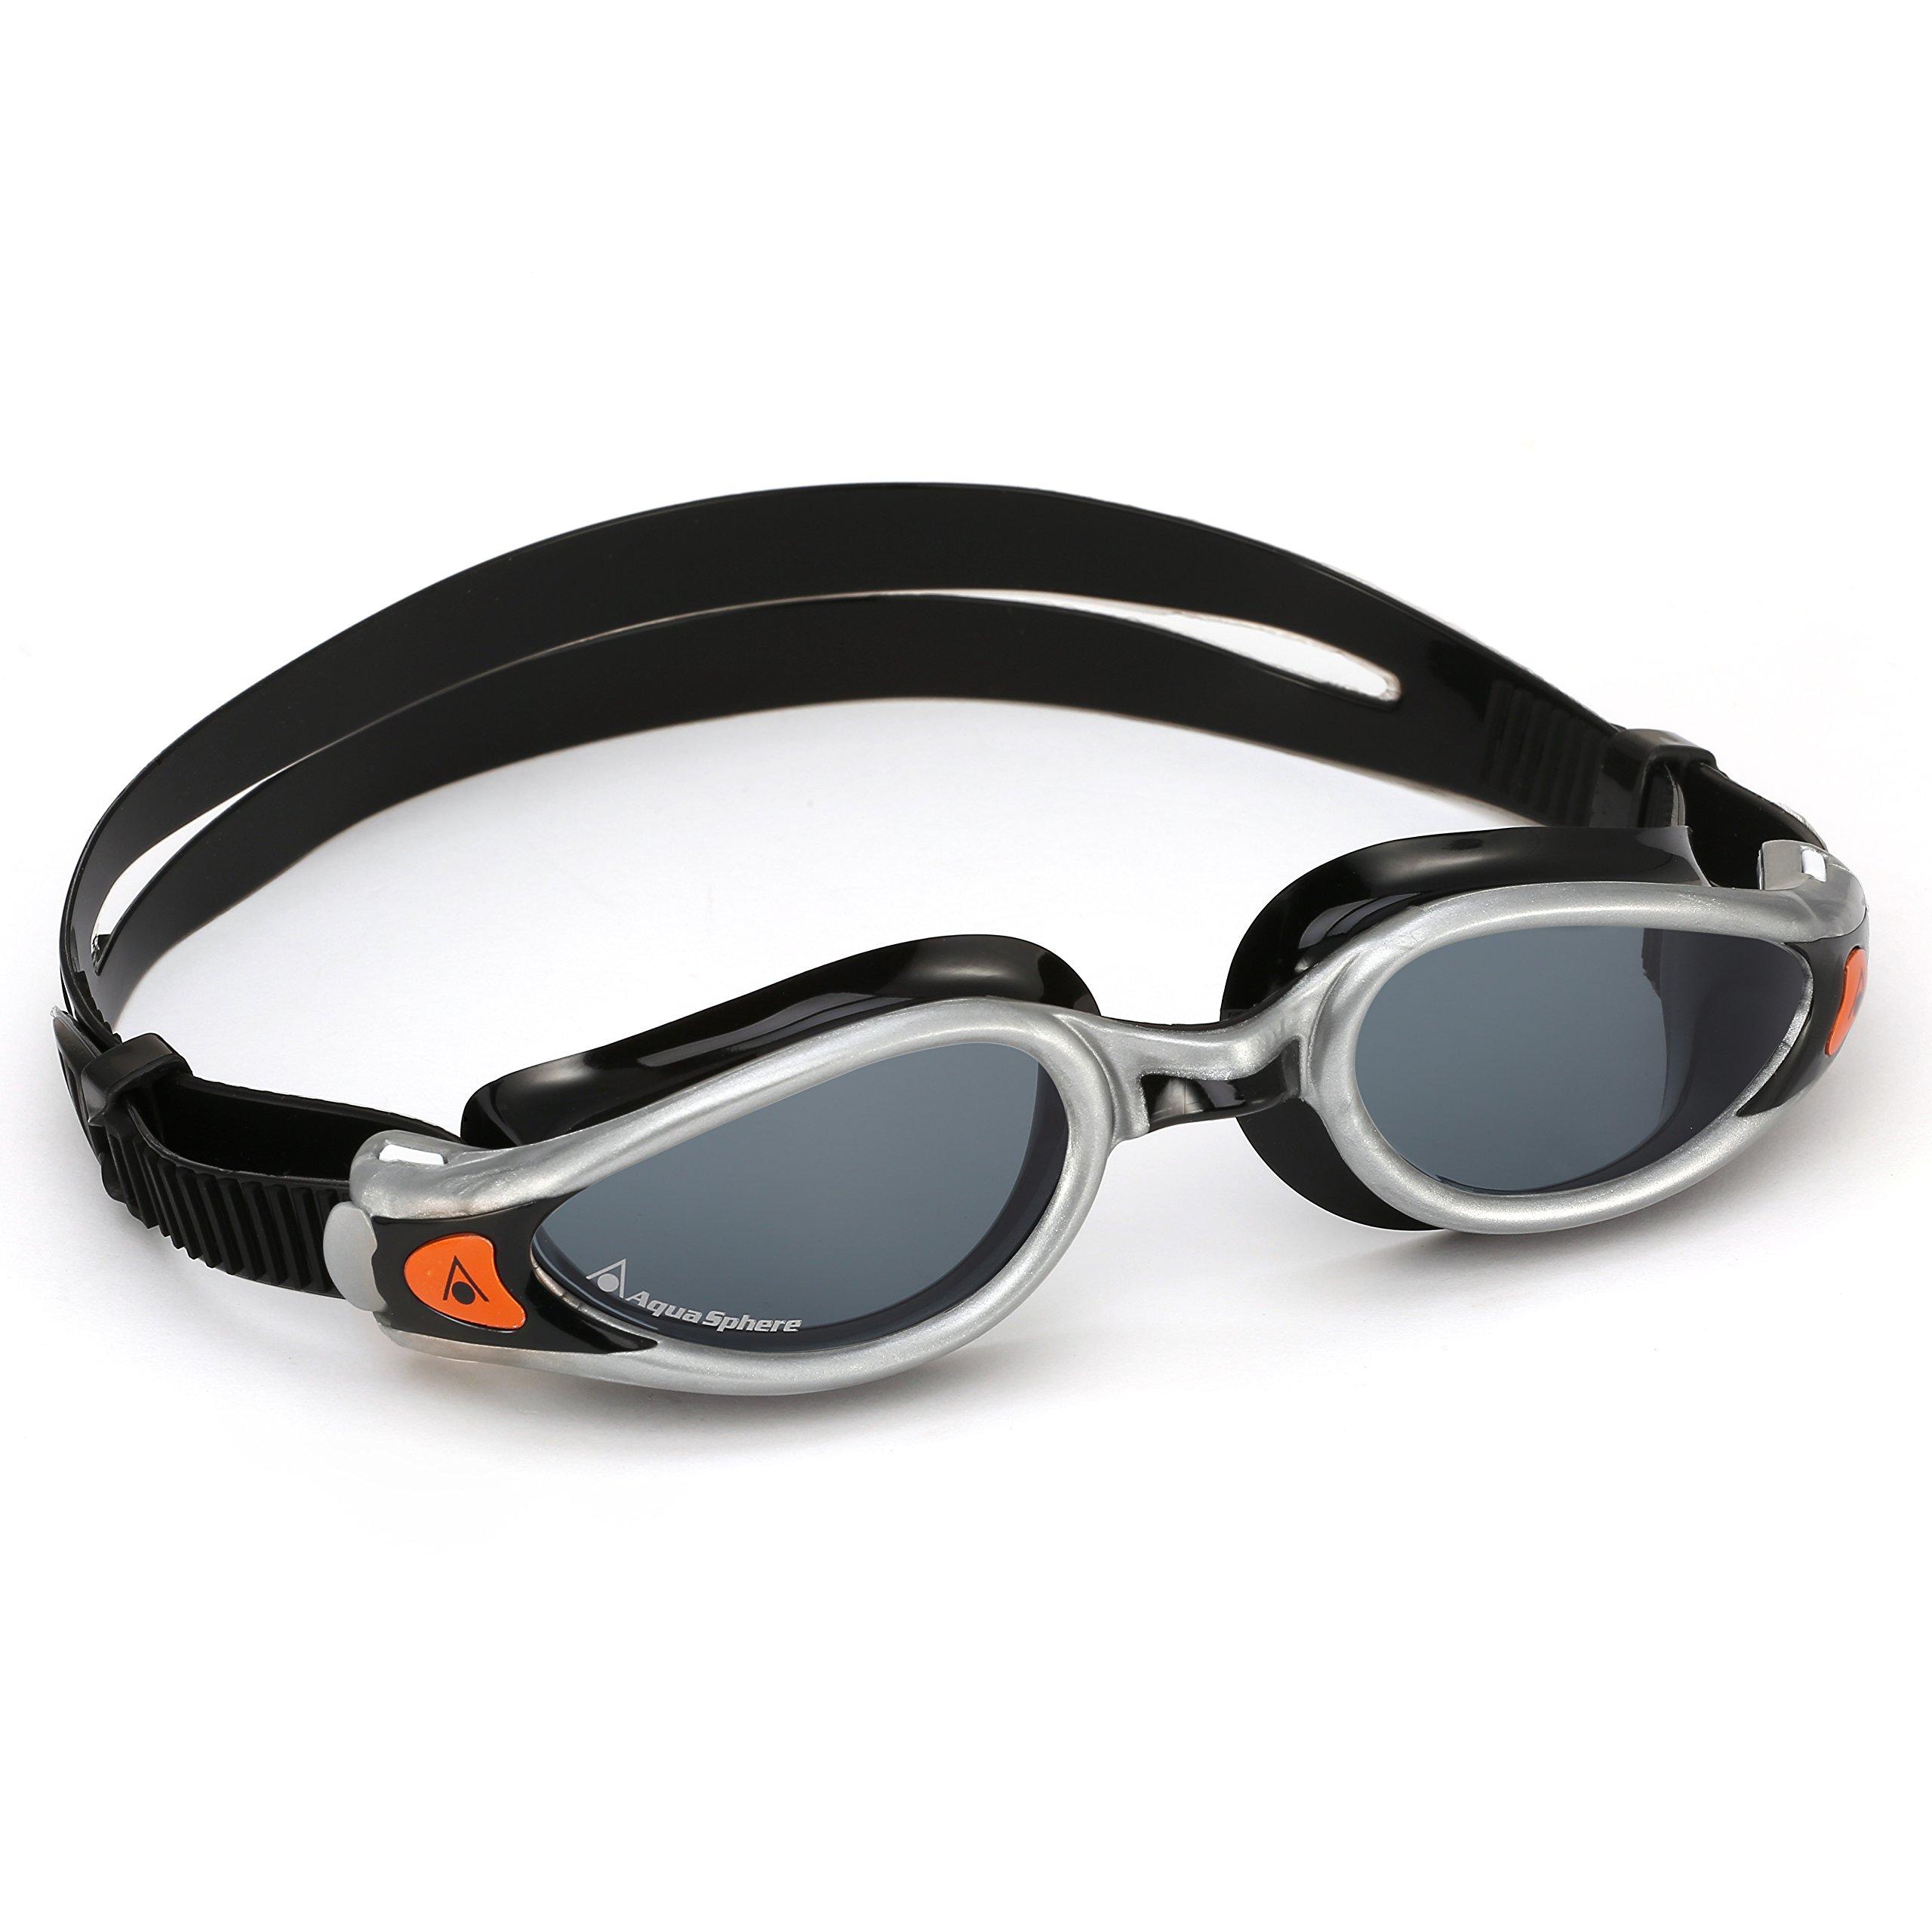 8de1cefa5 Aqua Sphere Kaiman EXO Smoke Lens Goggles